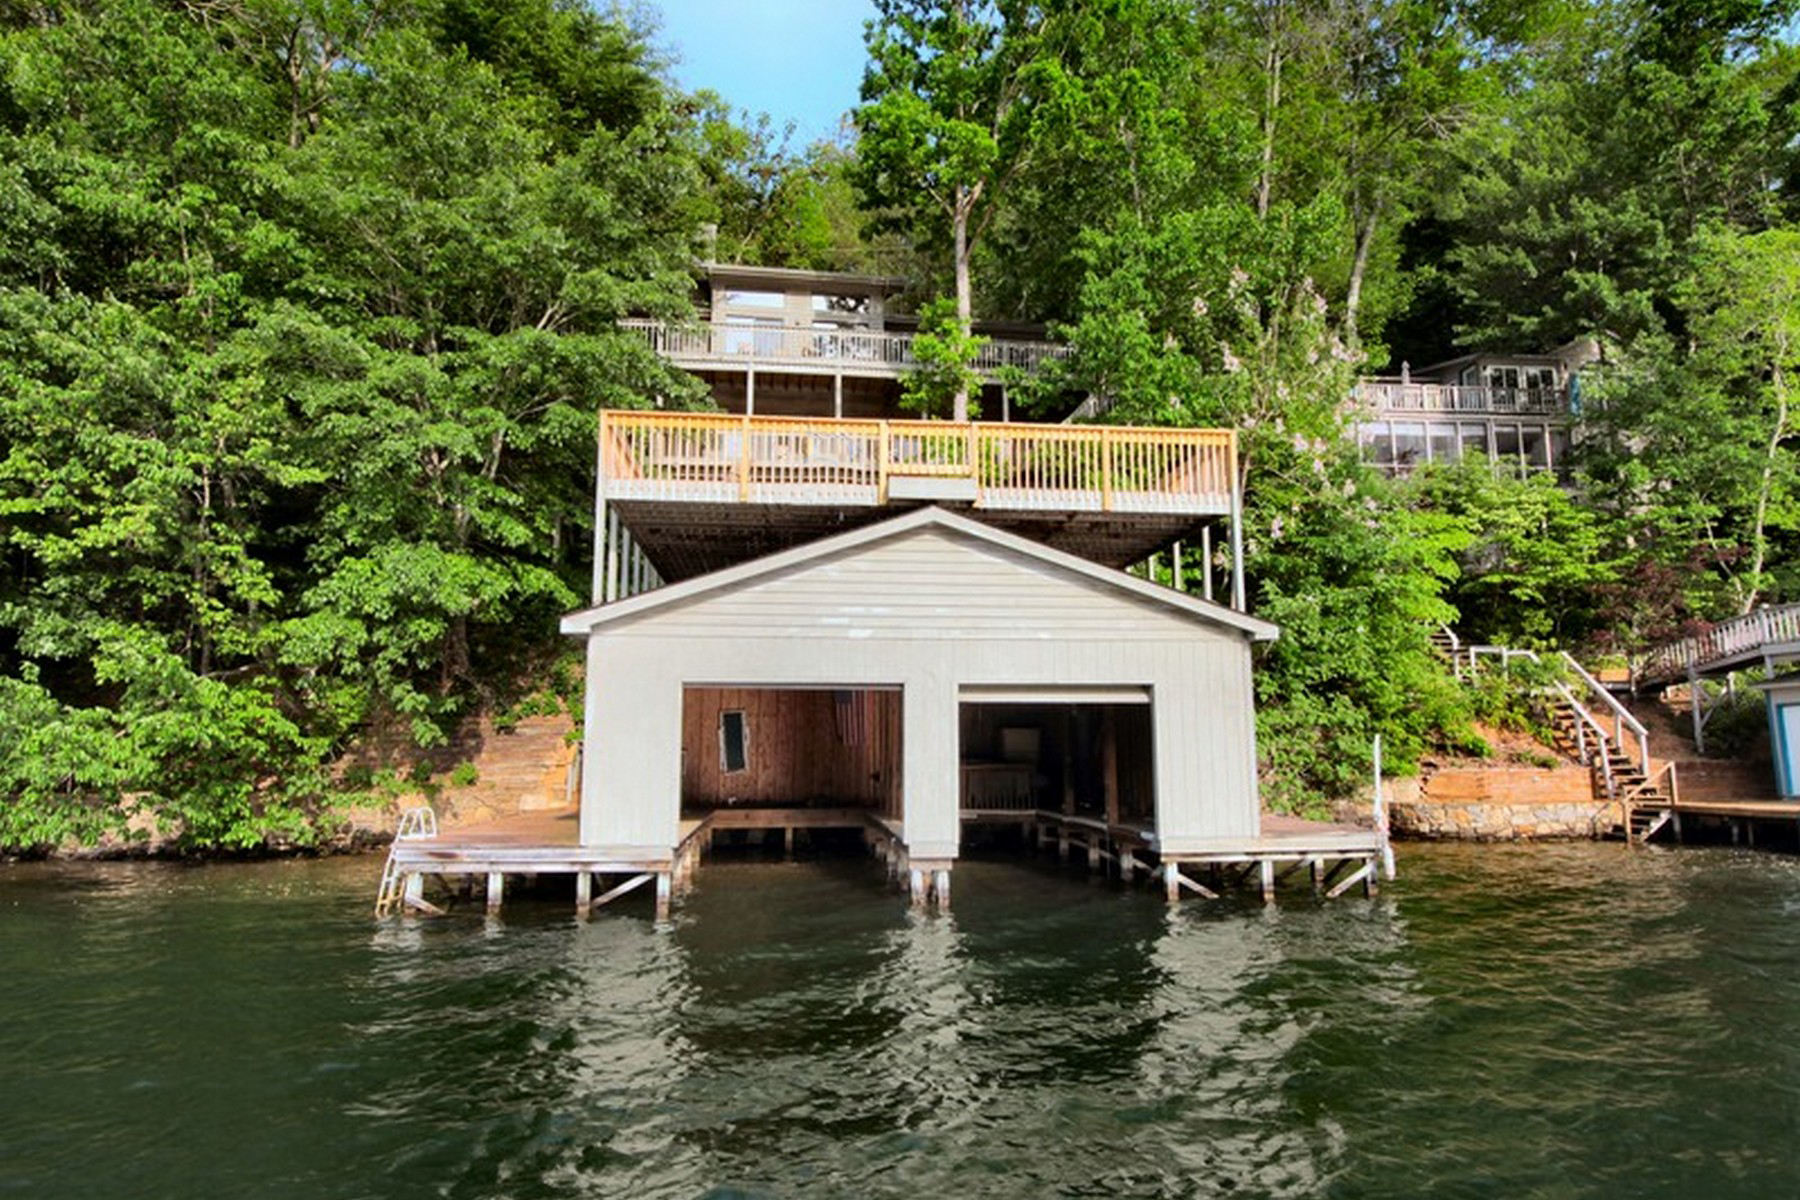 Single Family Homes for Active at 166 Lakeridge Road, Lake Lure, NC 166 Lake Ridge Drive Lake Lure, North Carolina 28746 United States